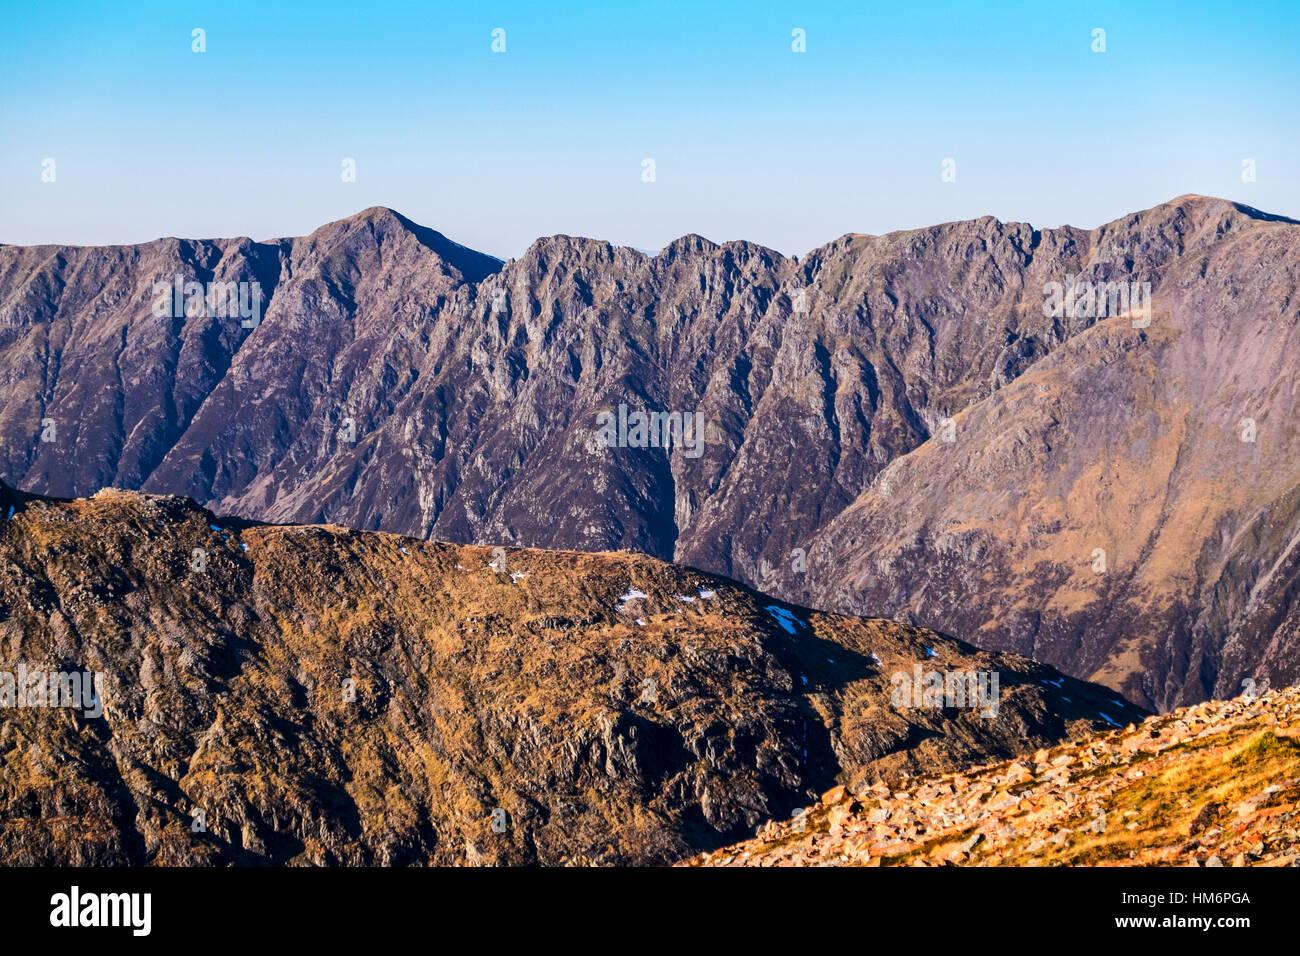 The Aonach Eagach ridge, Glencoe, Scotland seen from Buchaille Etive Beag - Stock Image